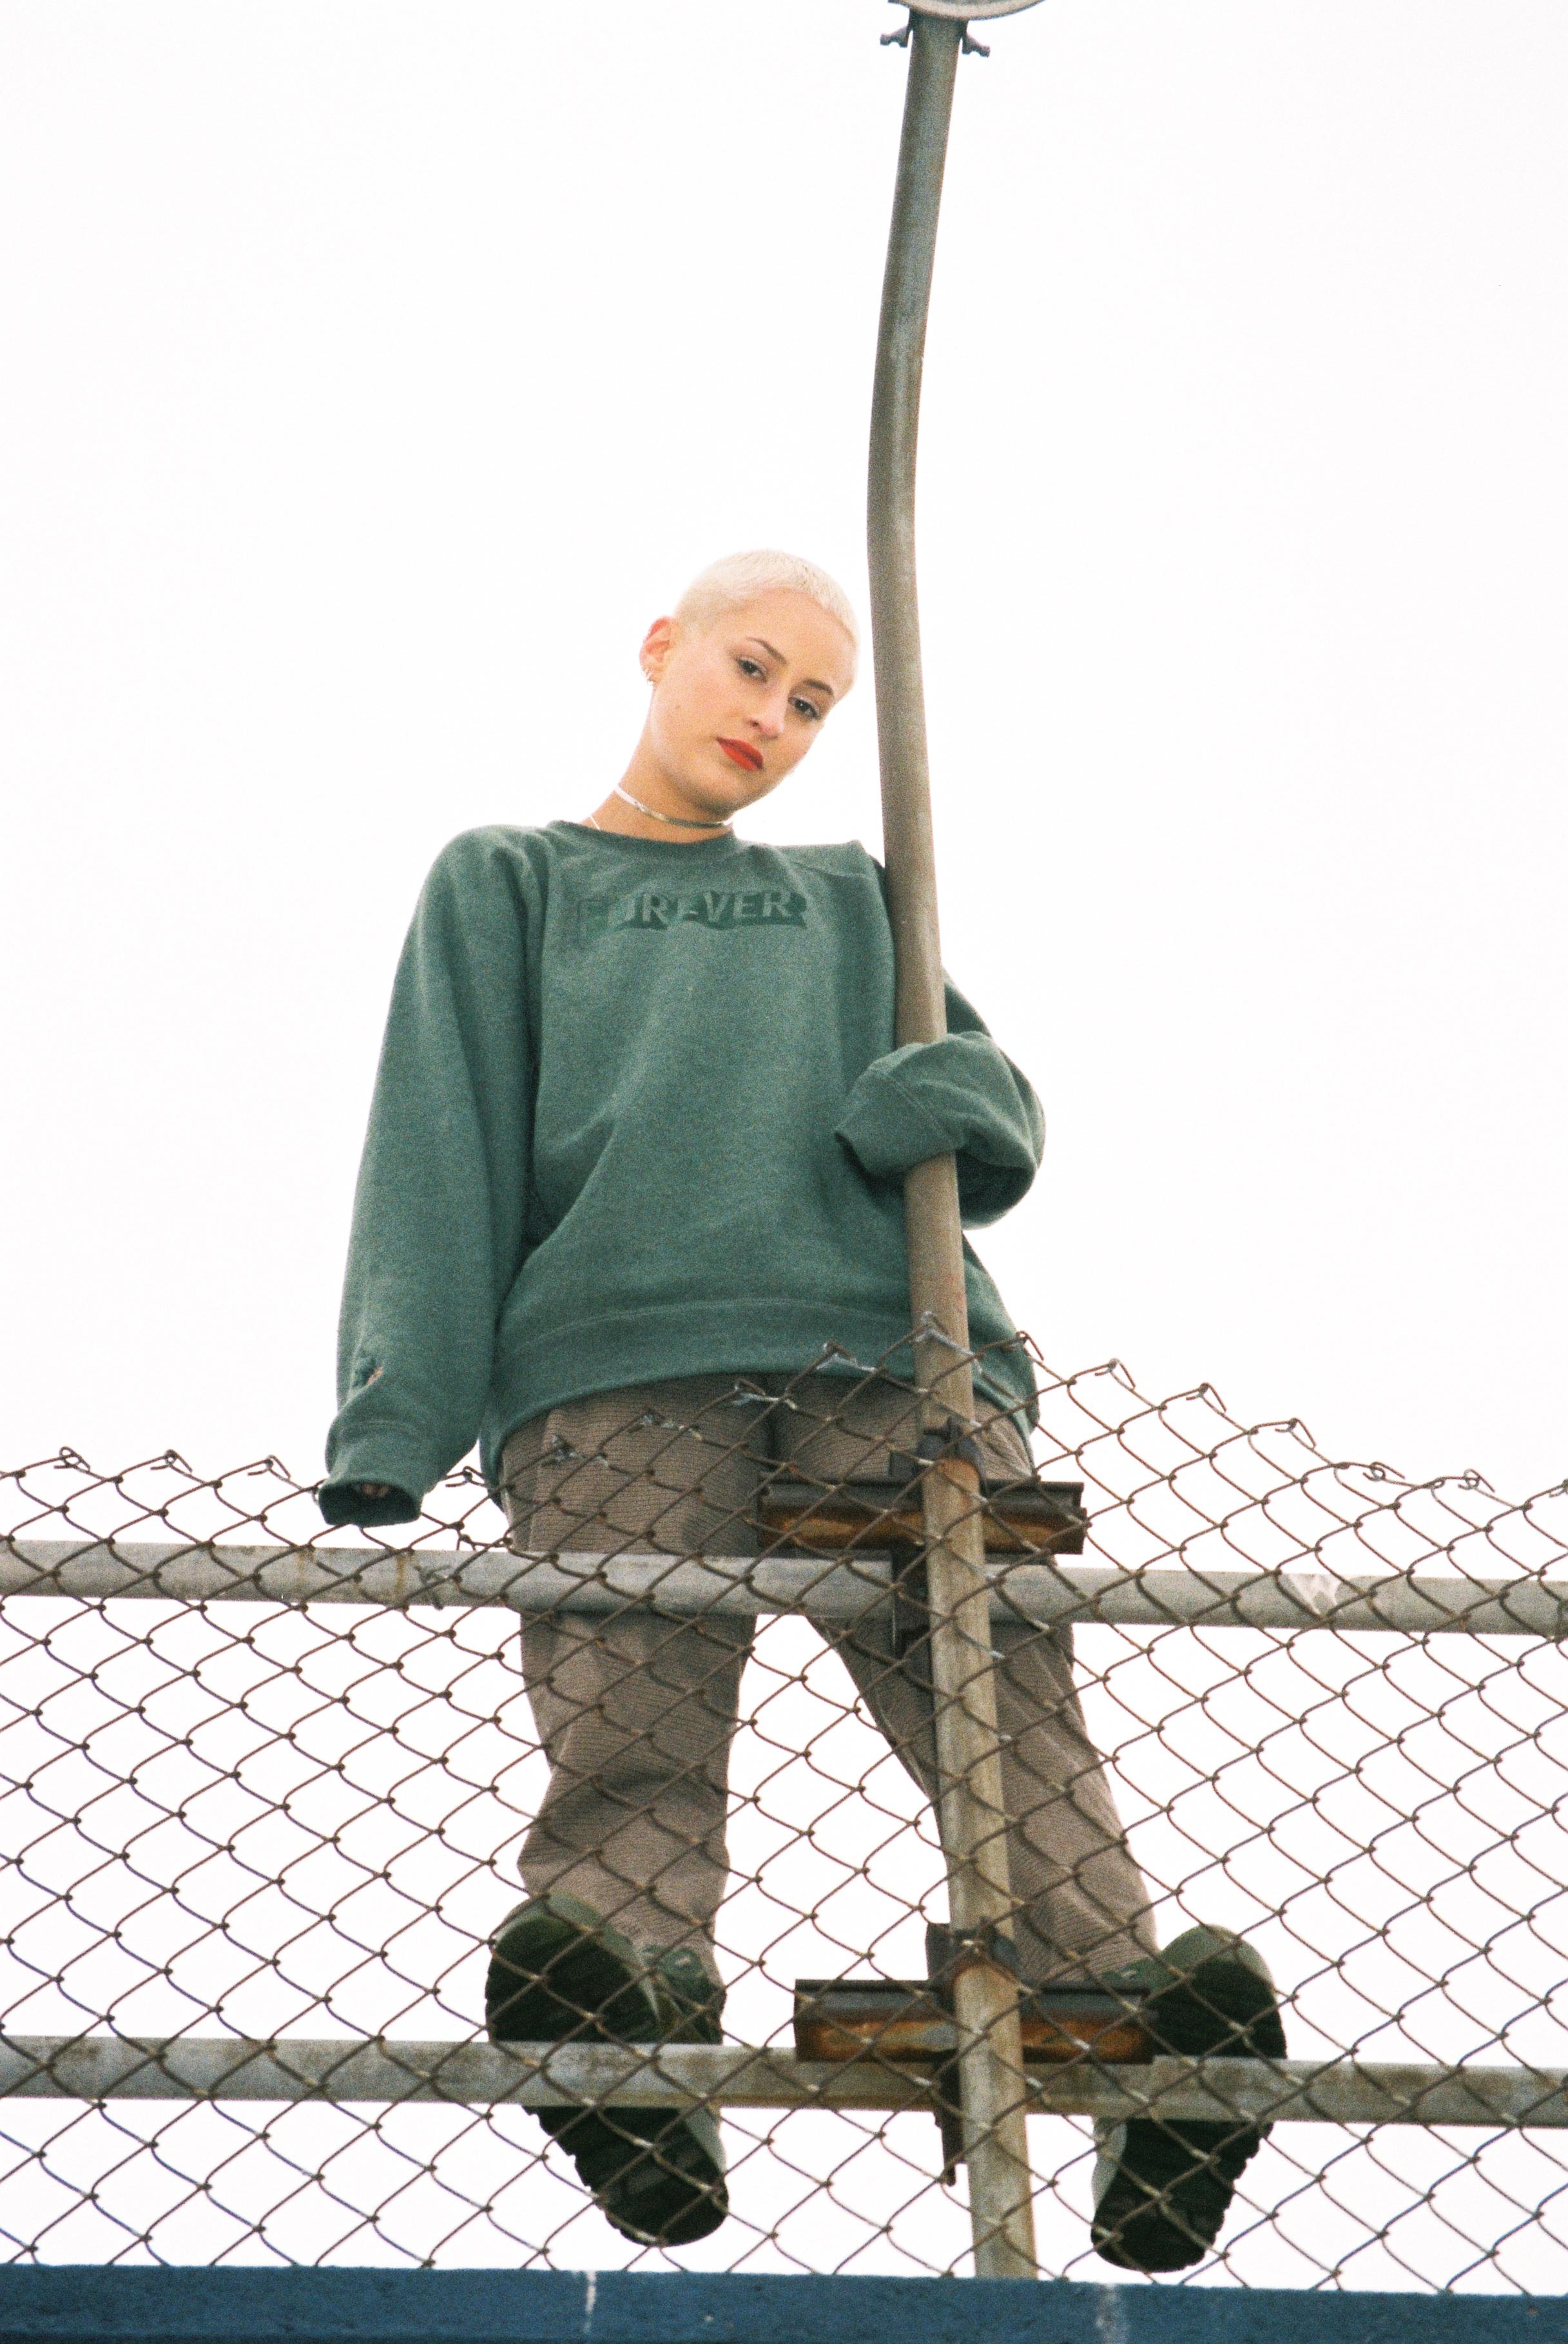 joyce.is-forever-sweatshirt-x-nylonsaddle-69.jpg